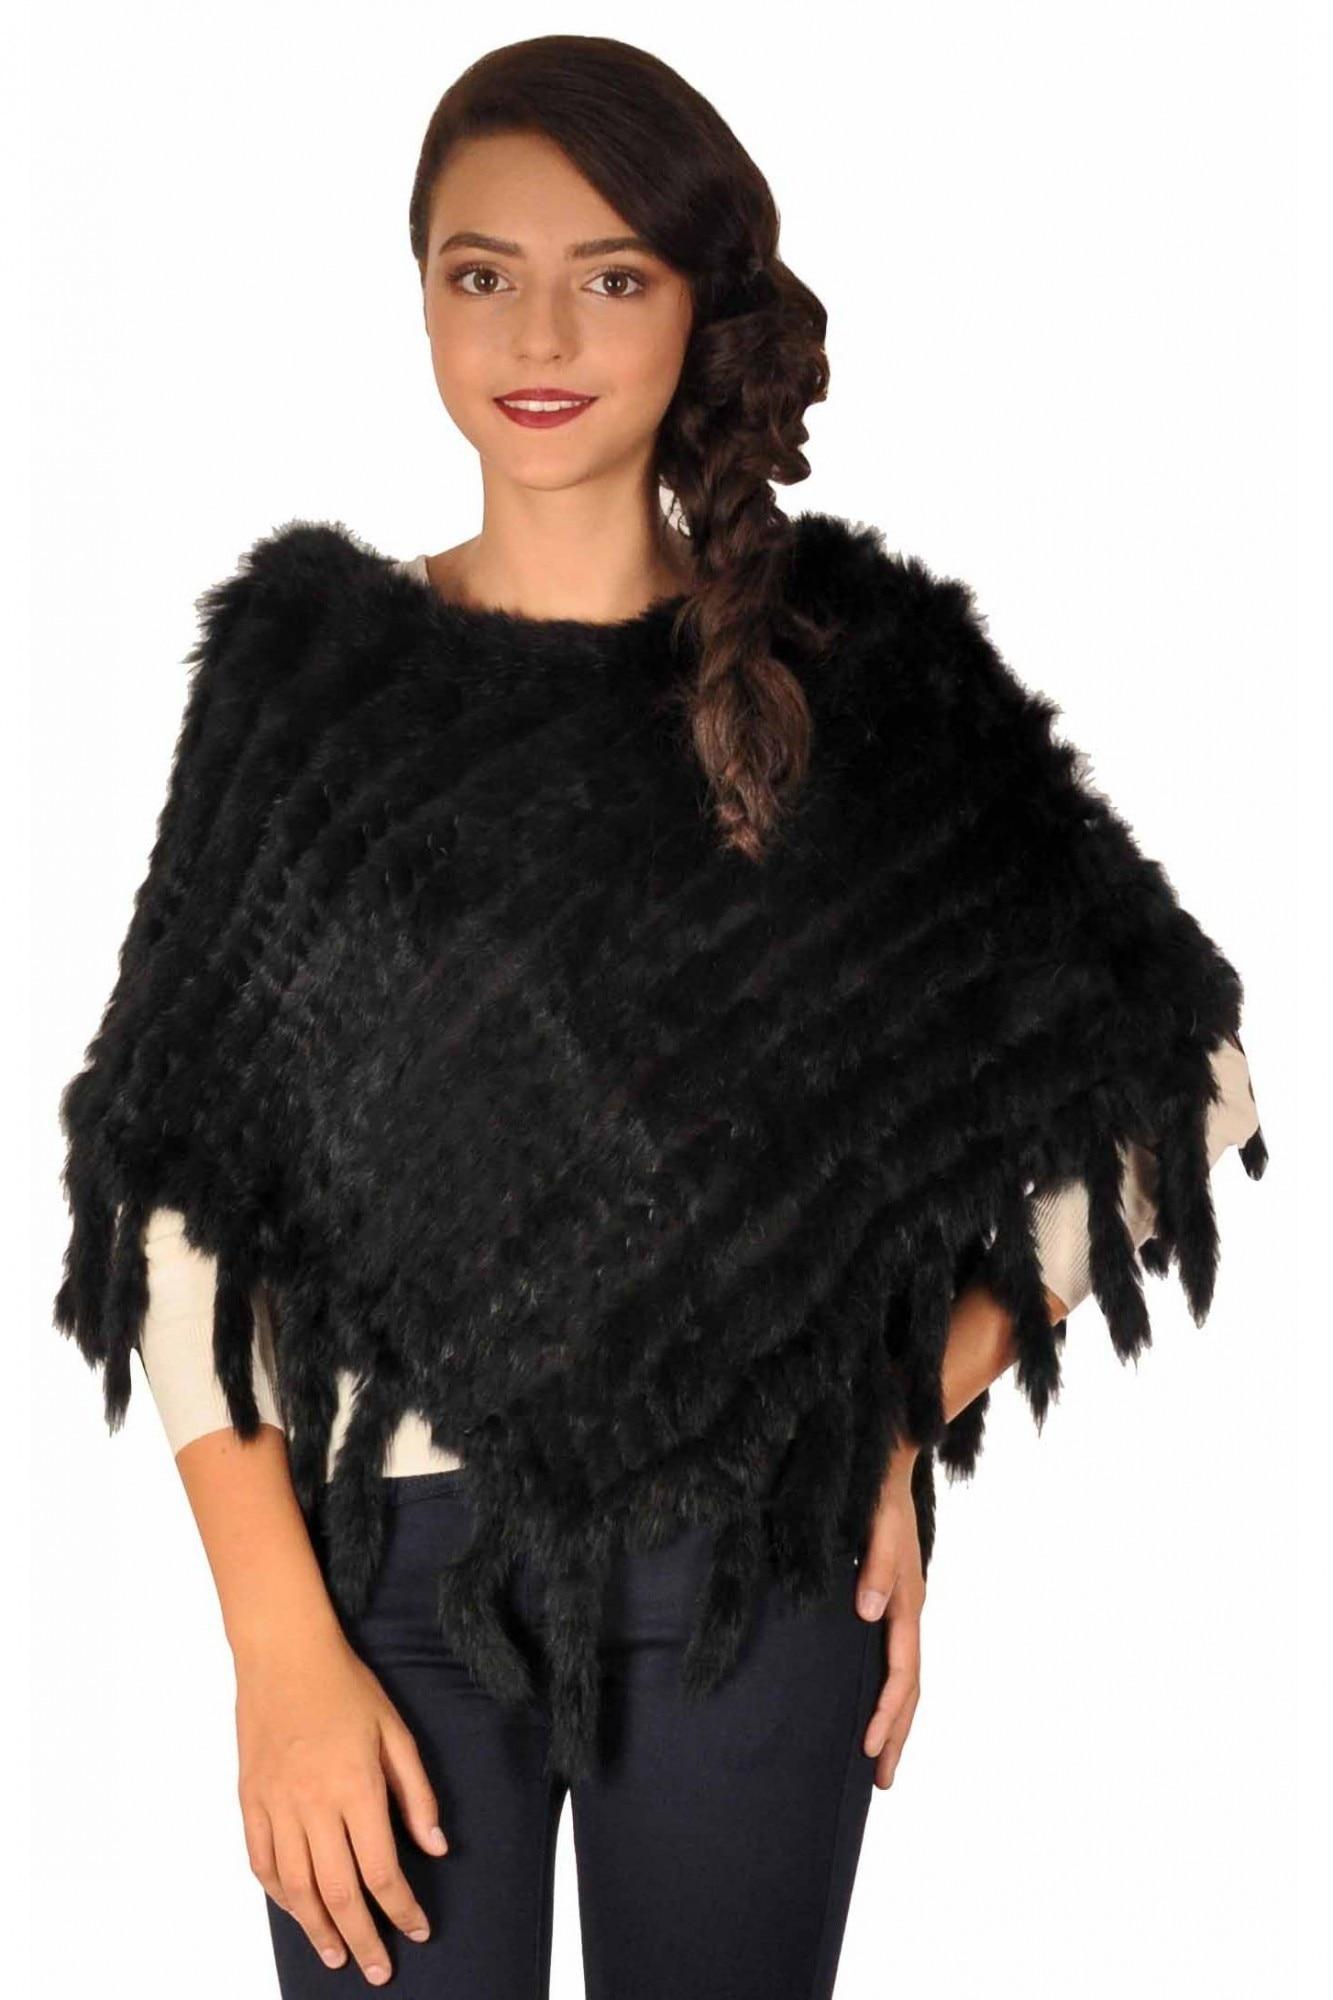 cel mai ieftin pret alta sansa oferte grozave 2017 Poncho negru elegant cu insertii blana naturala 021N de dama La Femme, 38 -  eMAG.ro